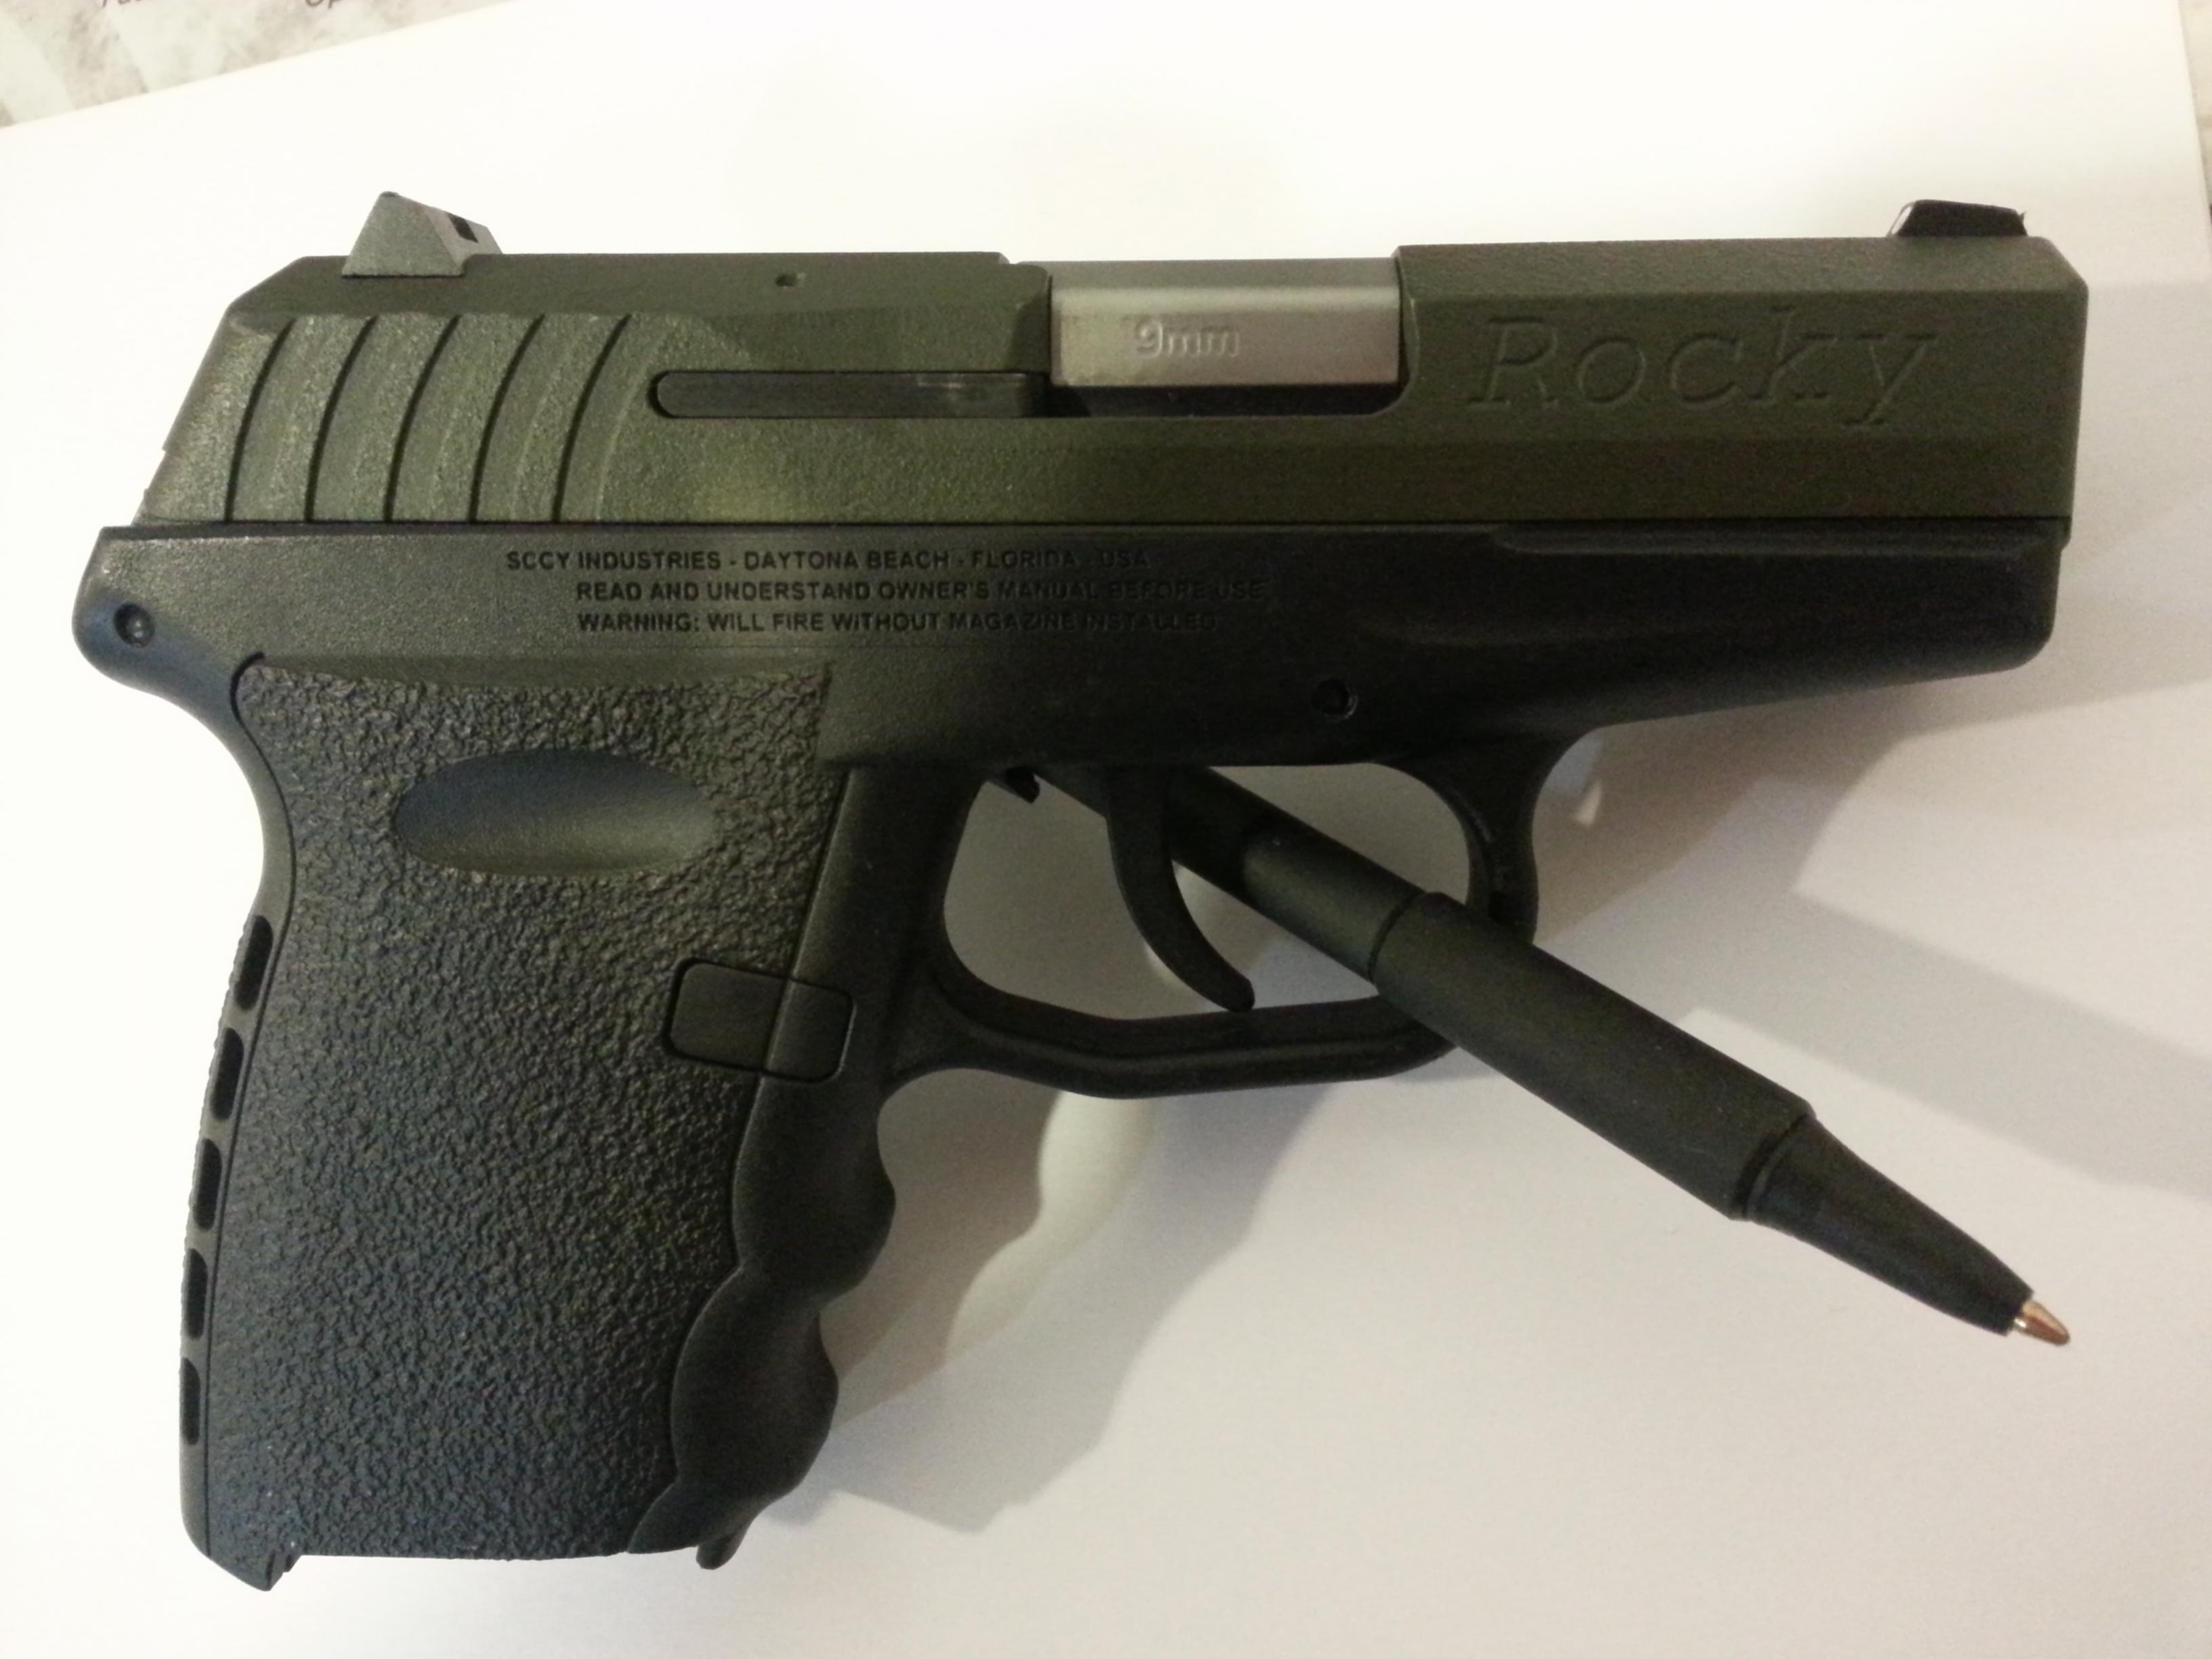 Sccy gen 2 pistol 9mm-20130911_164642.jpg